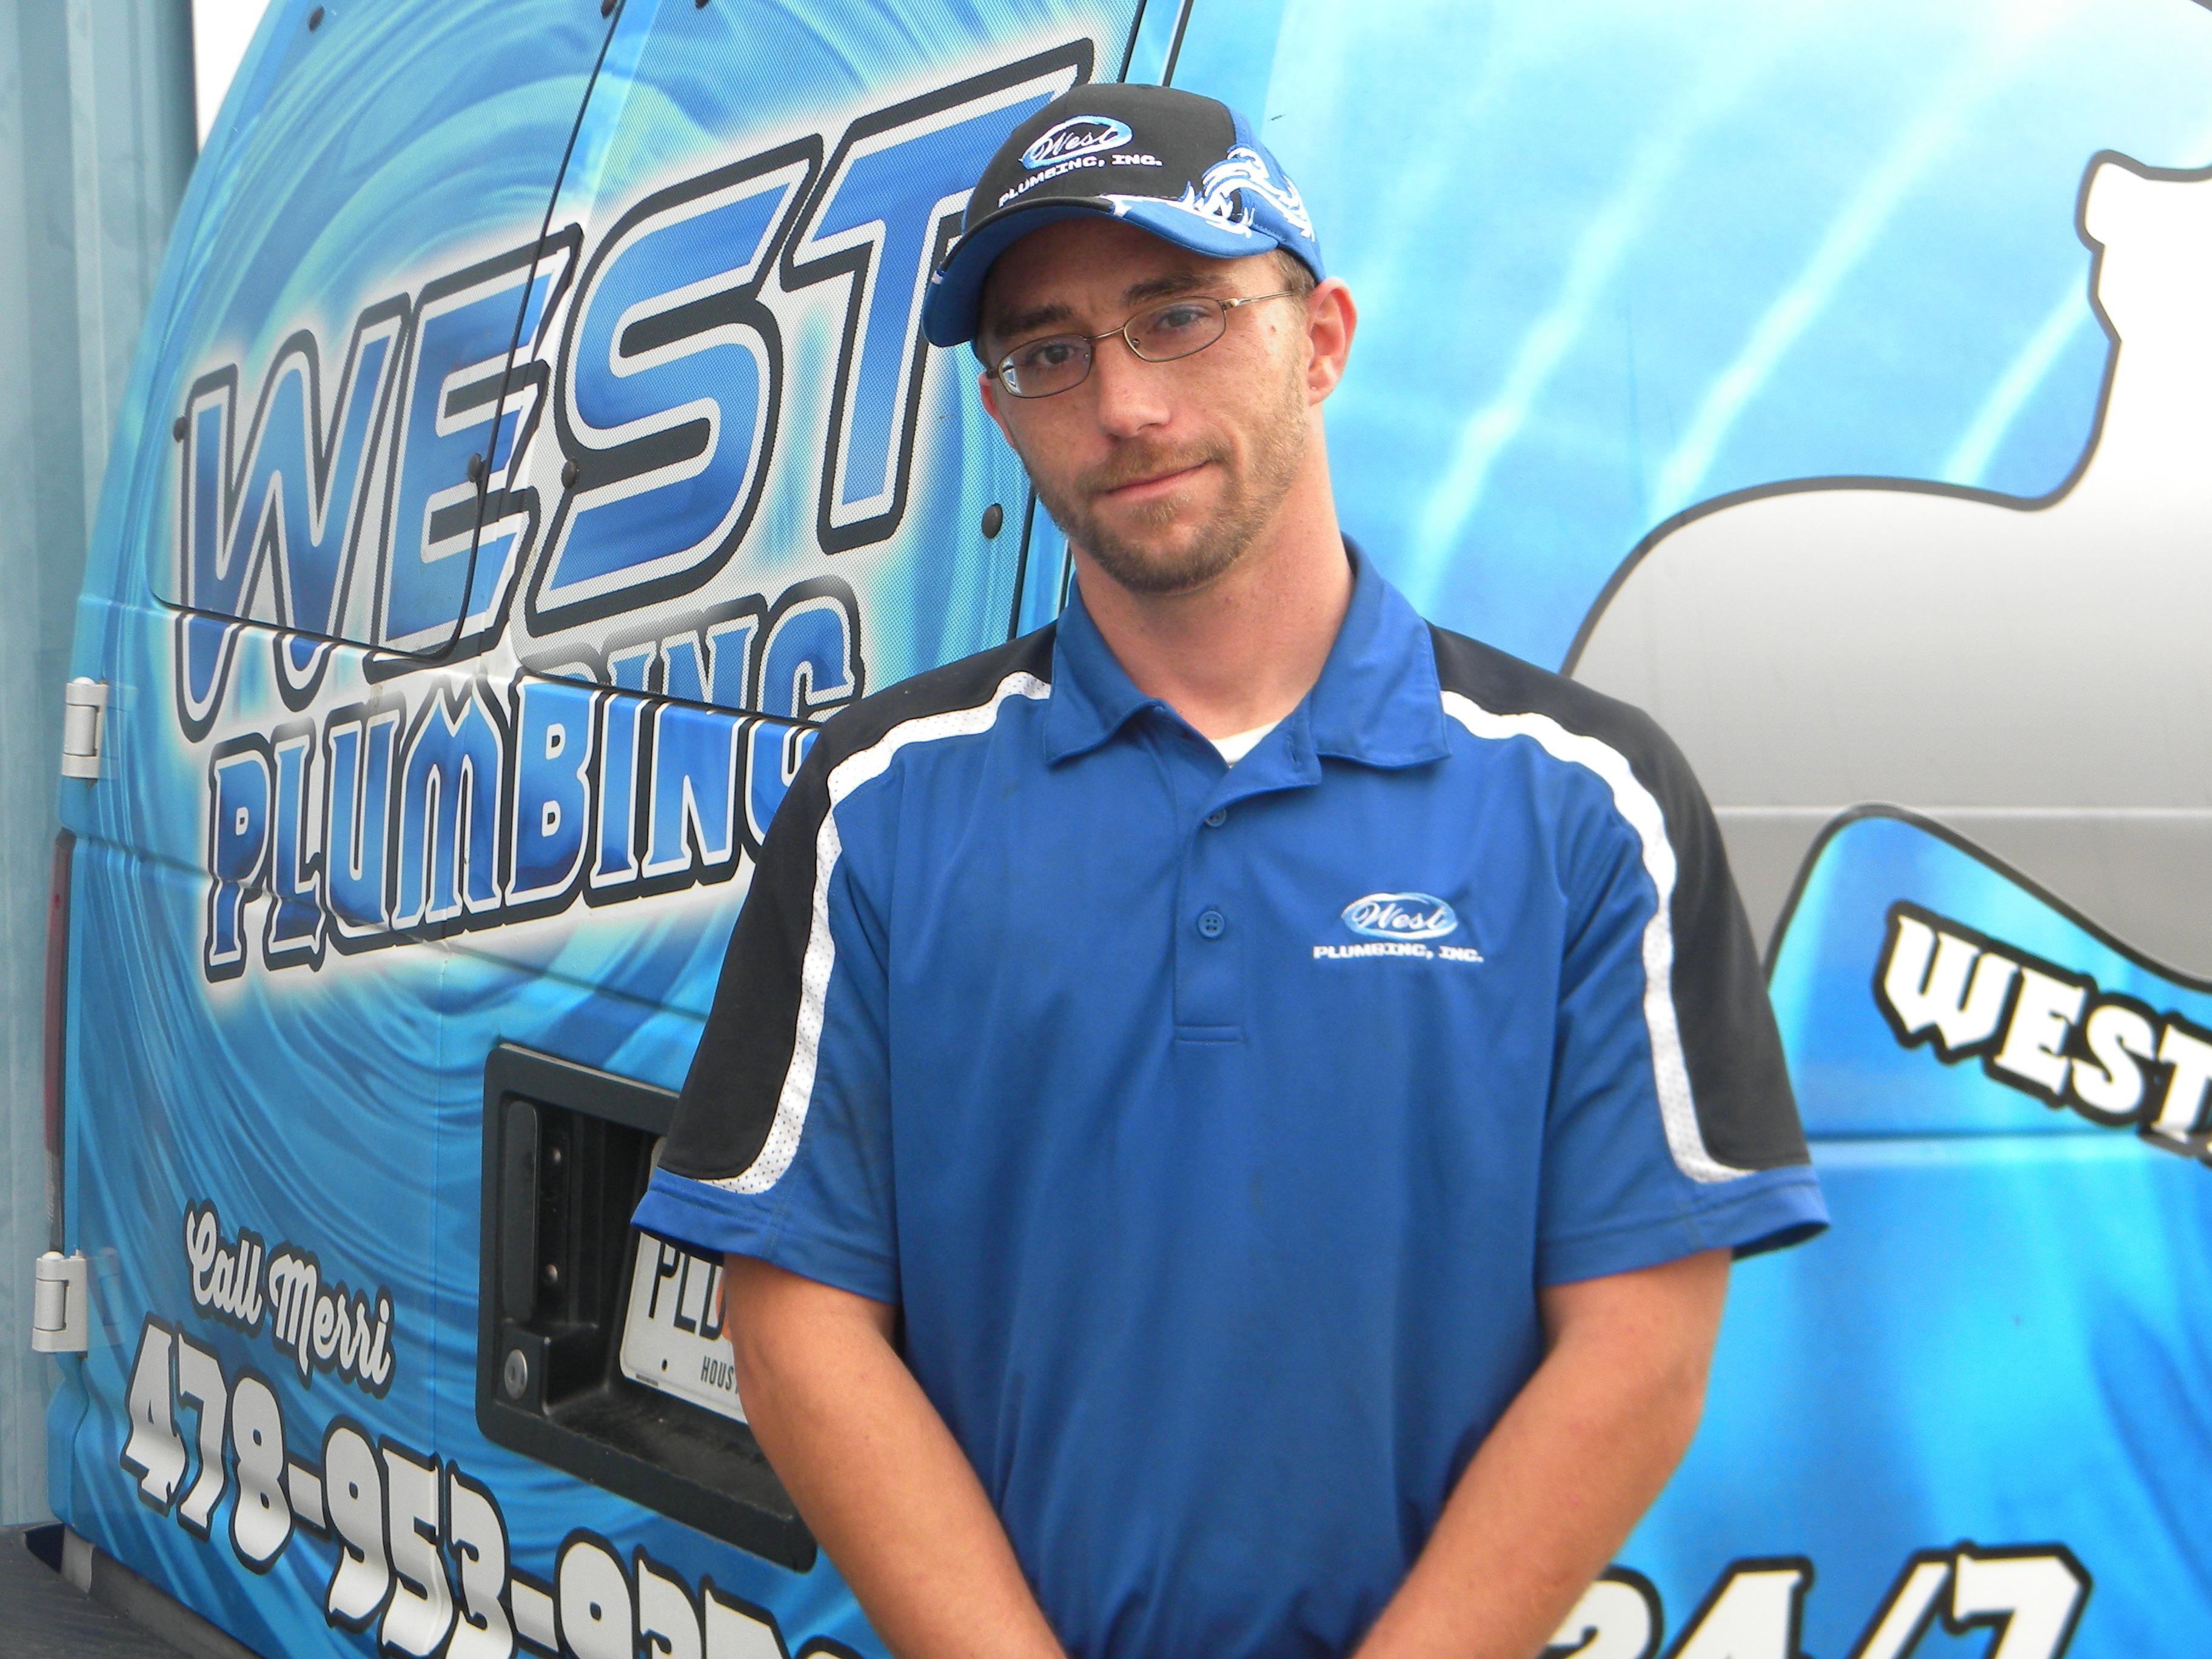 West Plumbing Inc In Warner Robins Ga 31088